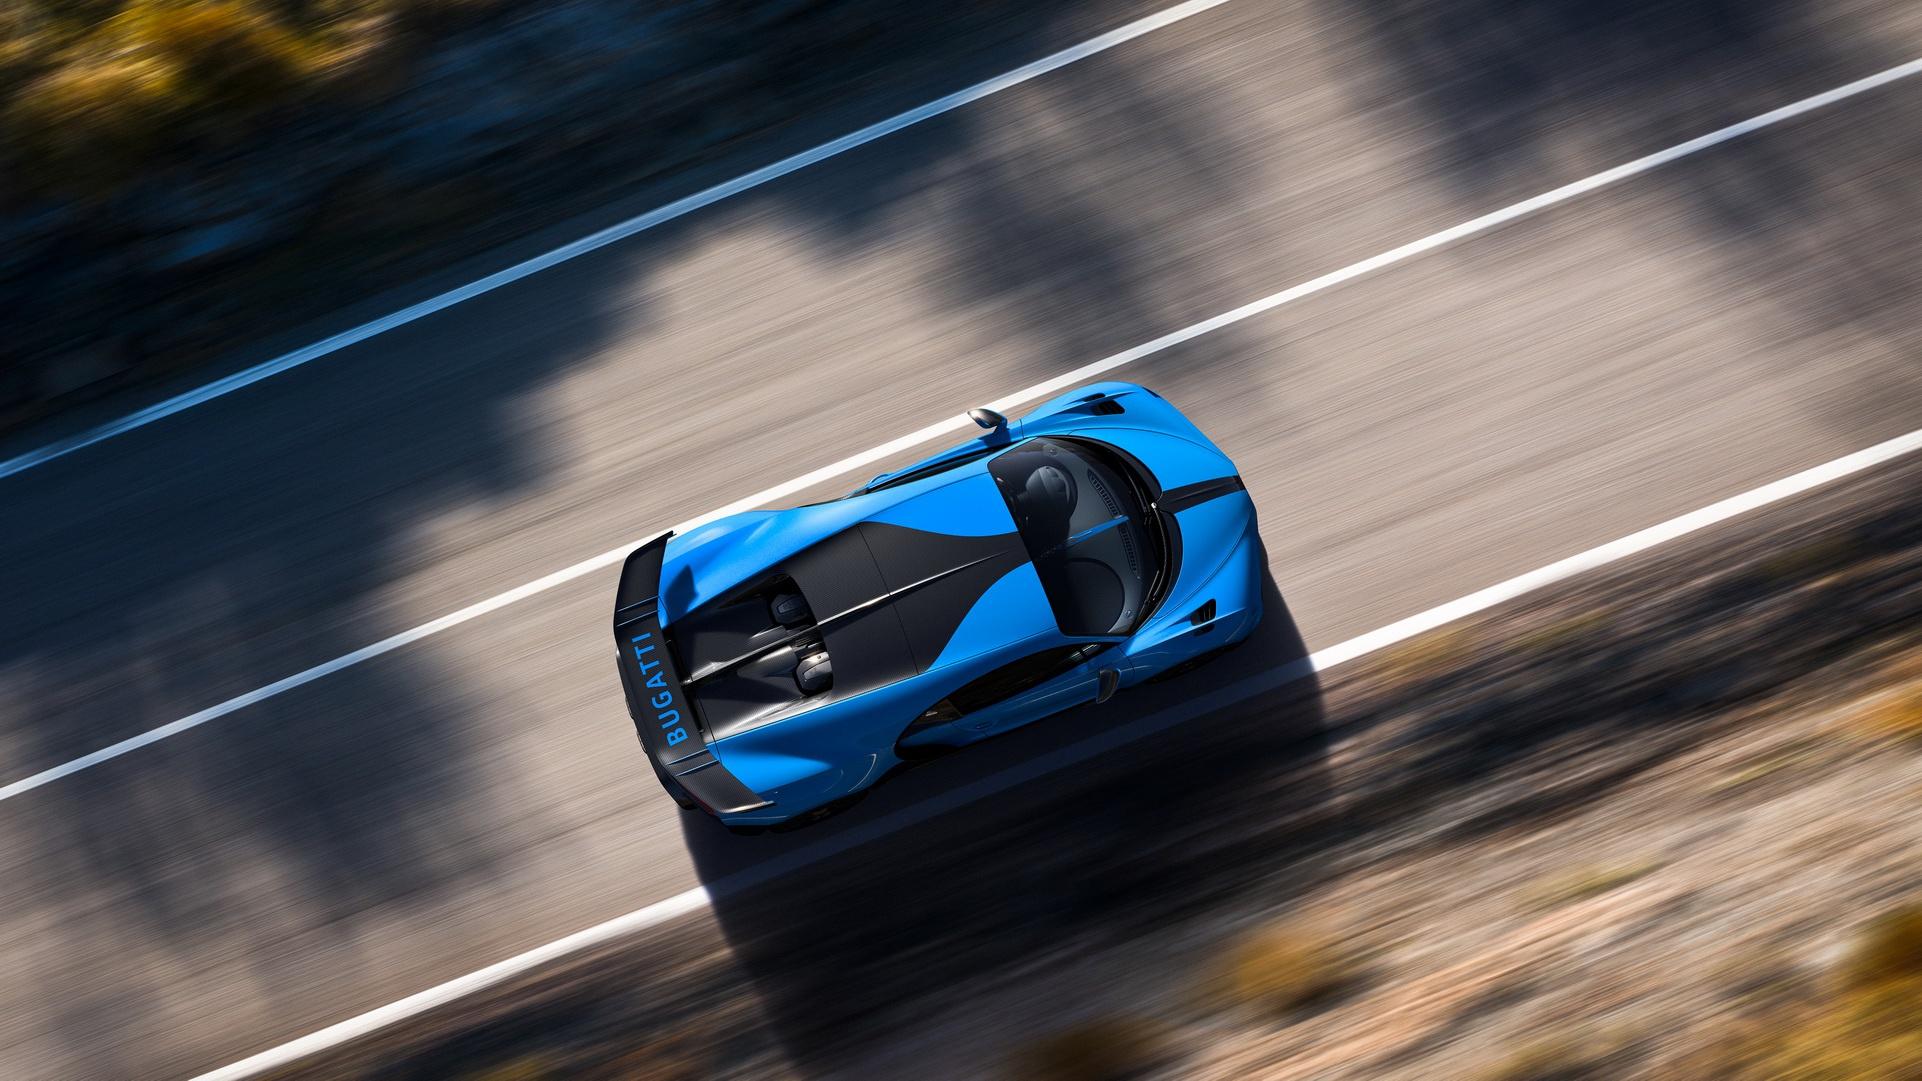 Bugatti Chiron phien ban moi ra mat - sieu xe gia 3,55 trieu USD hinh anh 8 A8.jpg